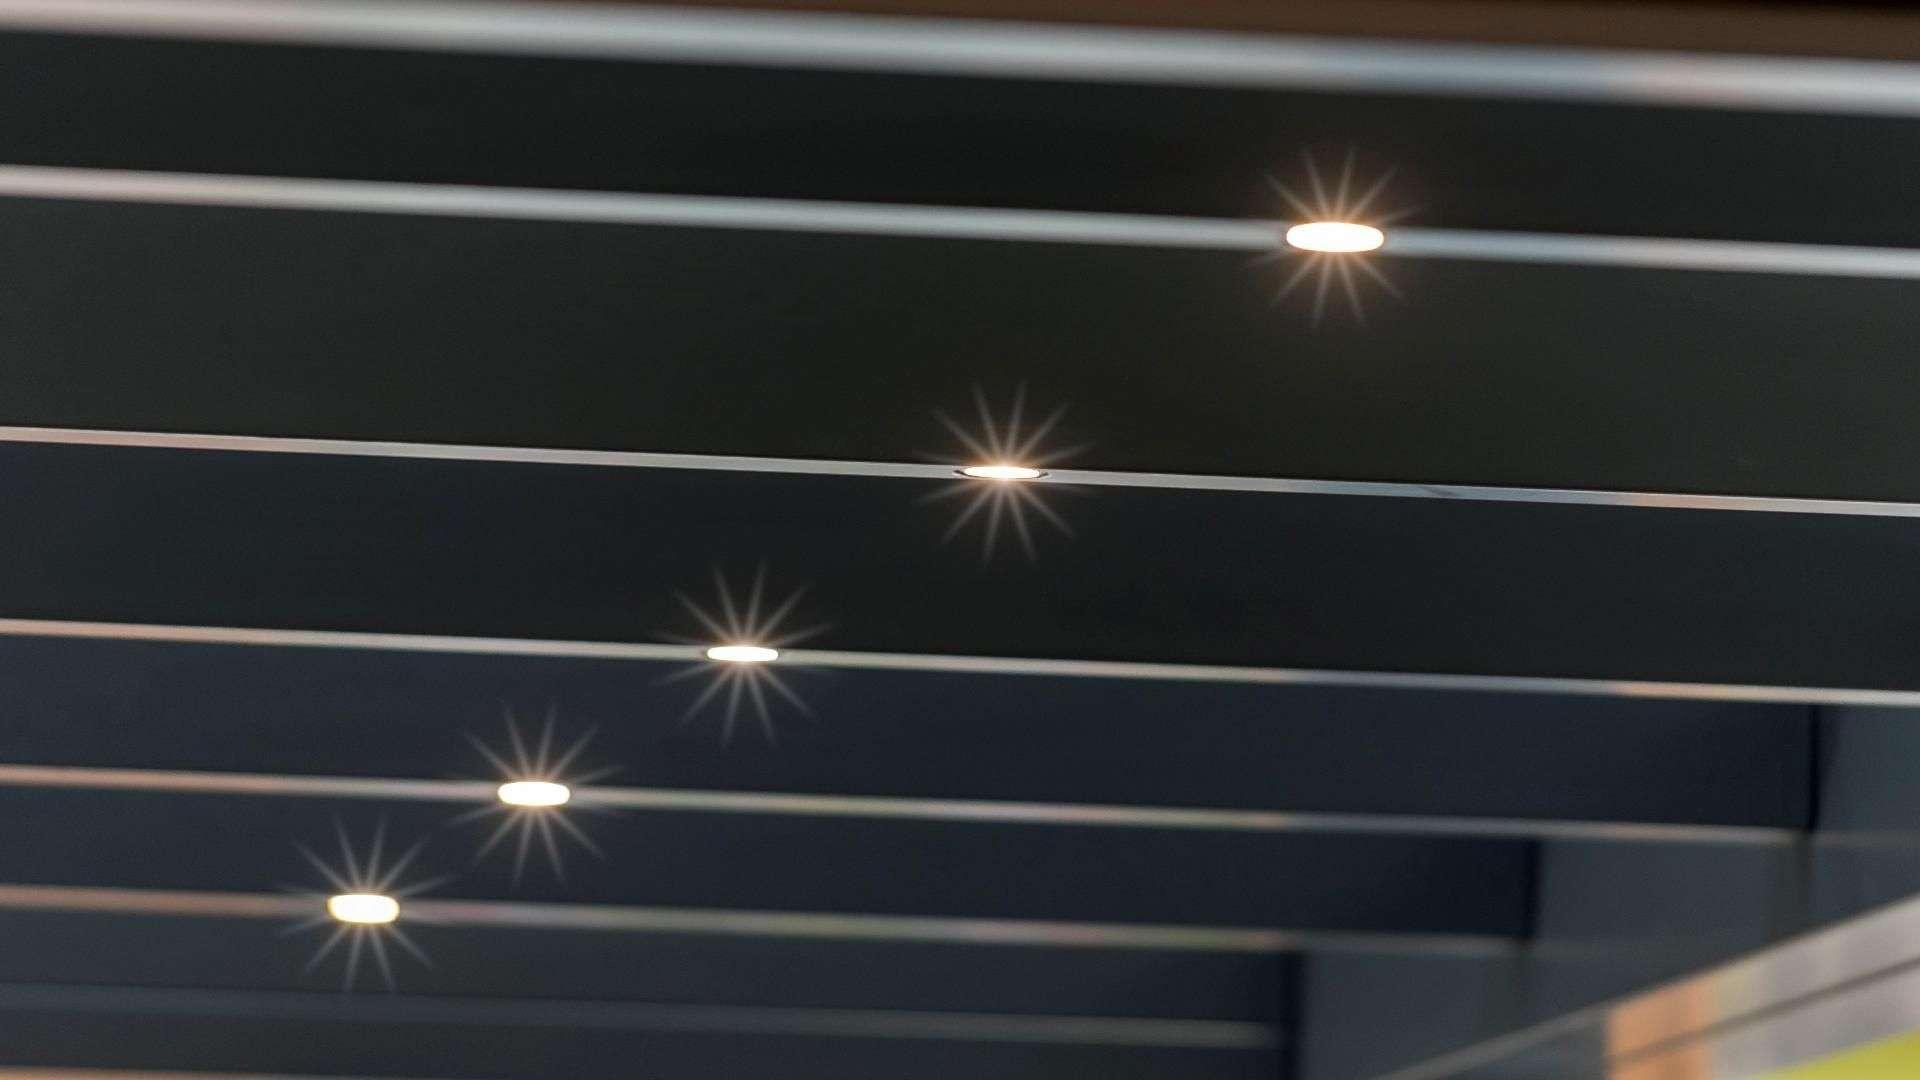 Nahansicht der LED-Beleuchtung in den Dachsparren